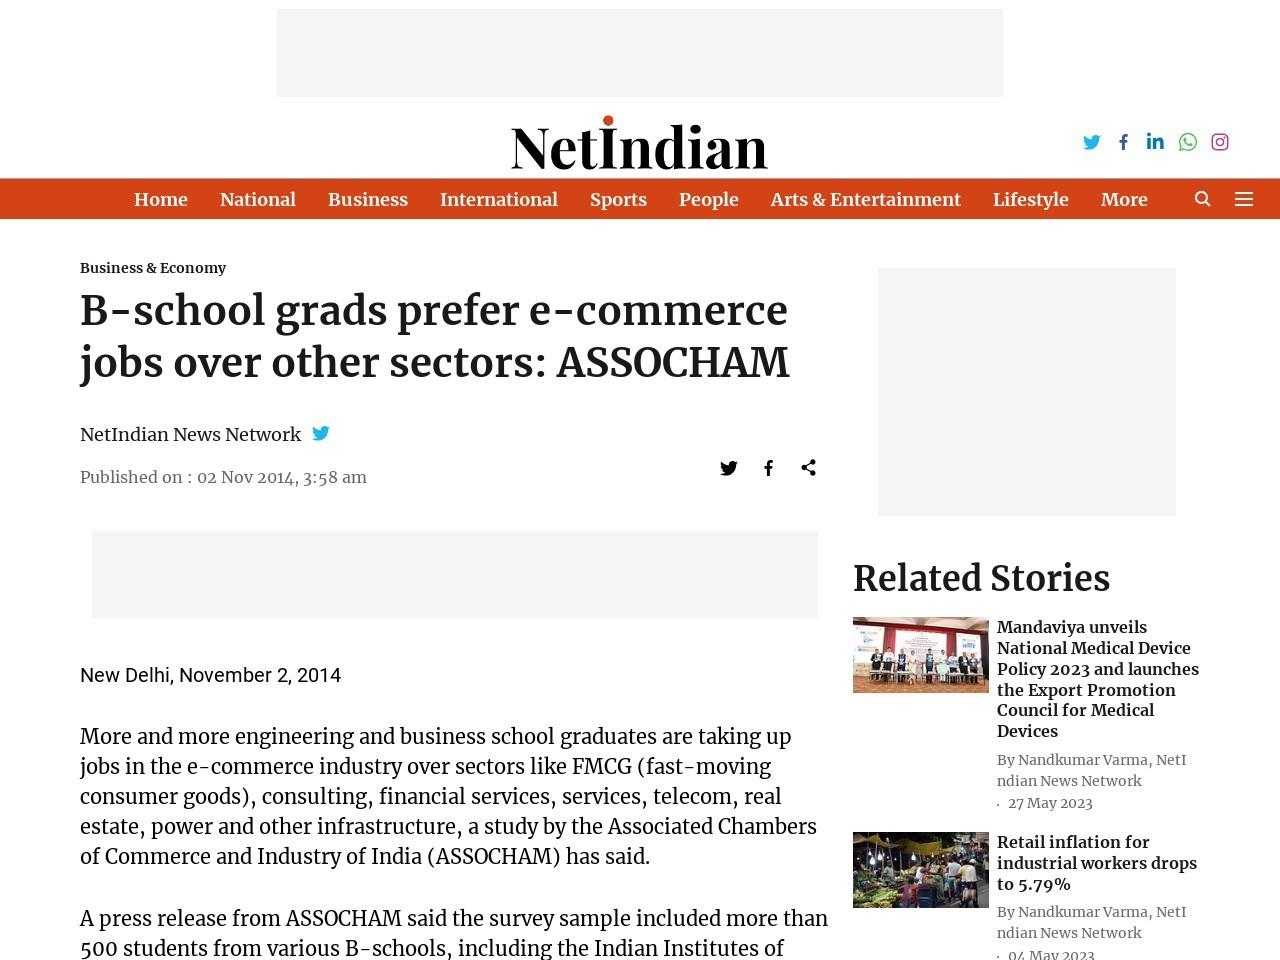 B-school grads prefer e-commerce jobs over other sectors: ASSOCHAM